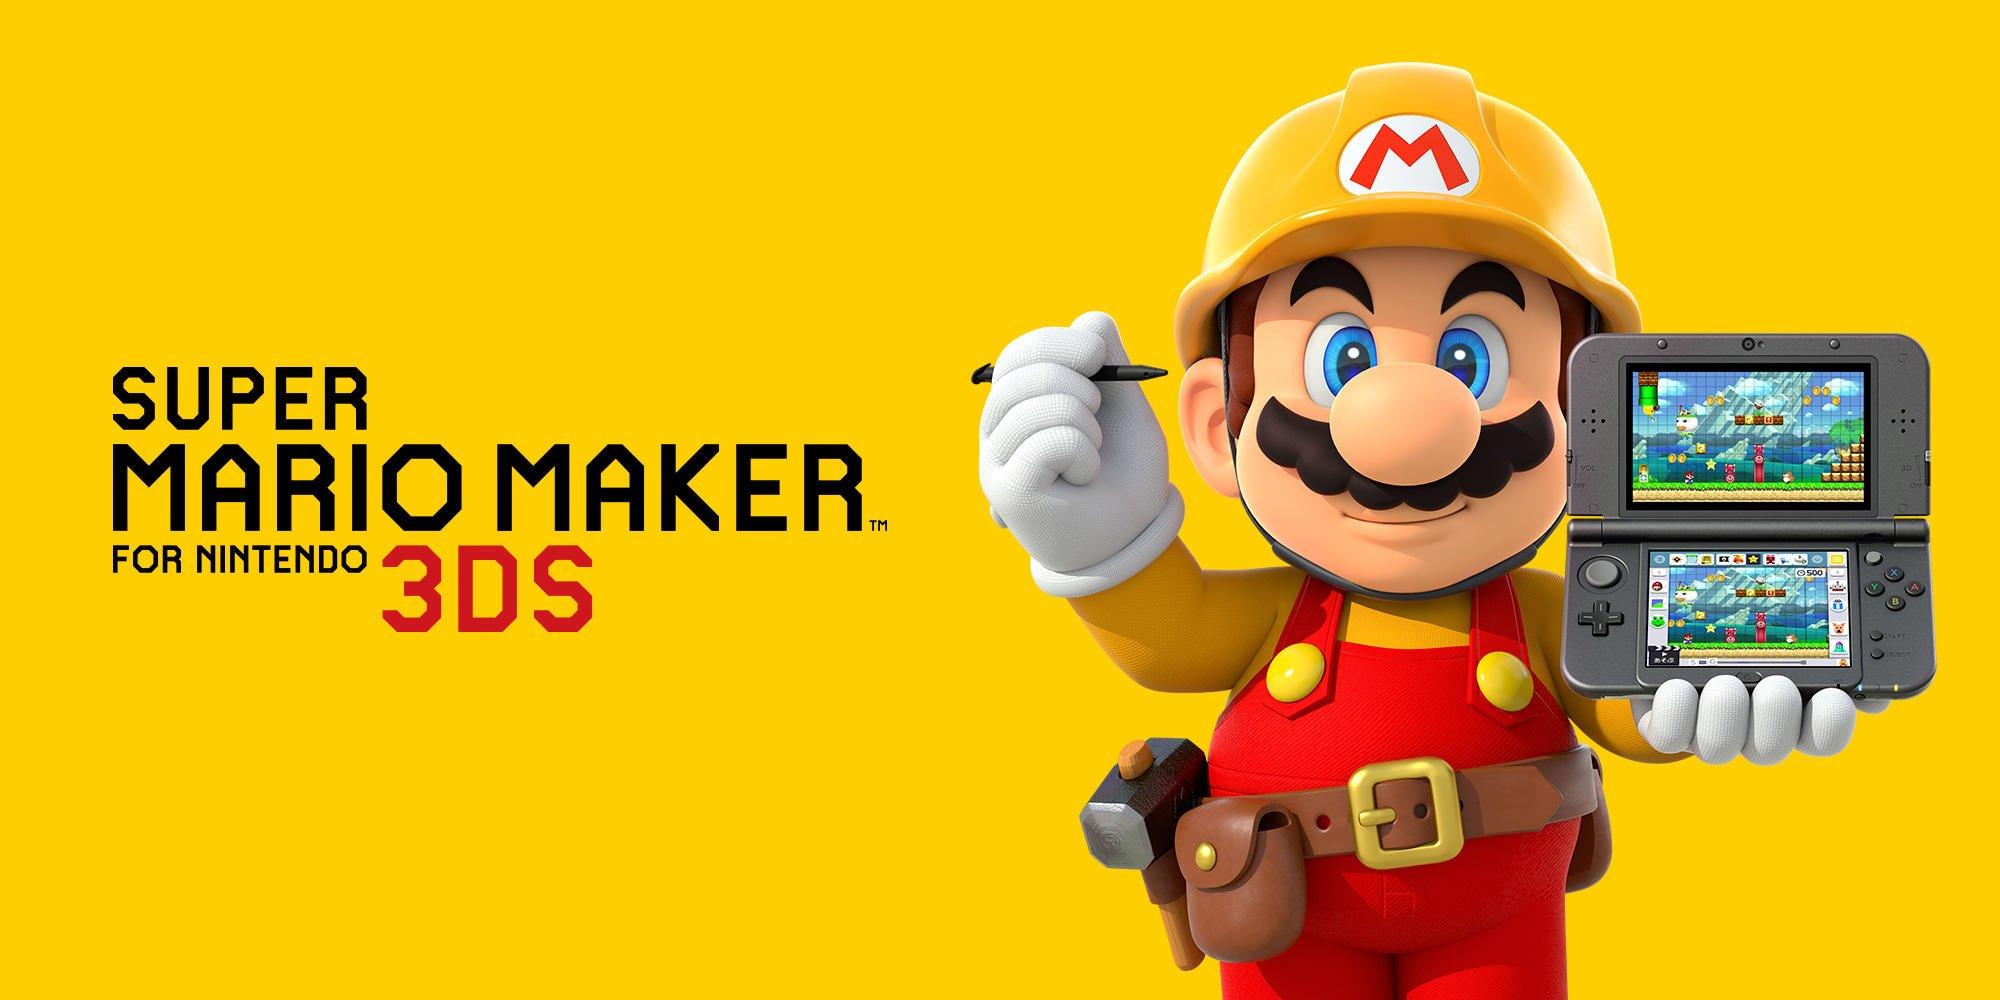 NintendoAUNZ_2016-Sep-02